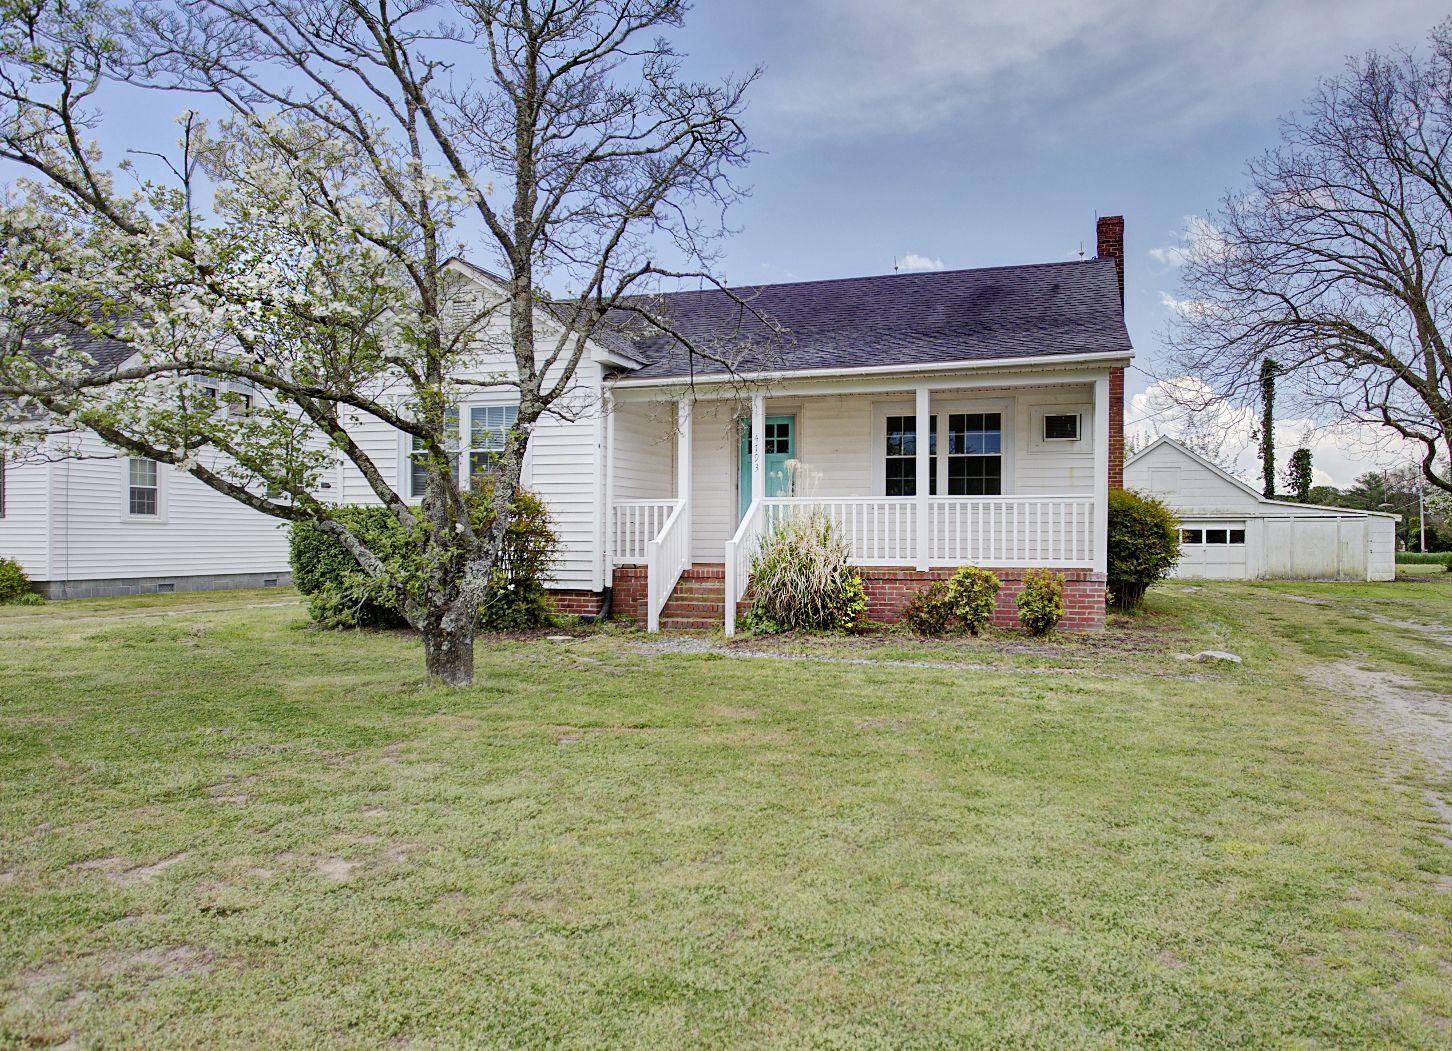 4793 Clay Bank Rd, Gloucester, VA 23061